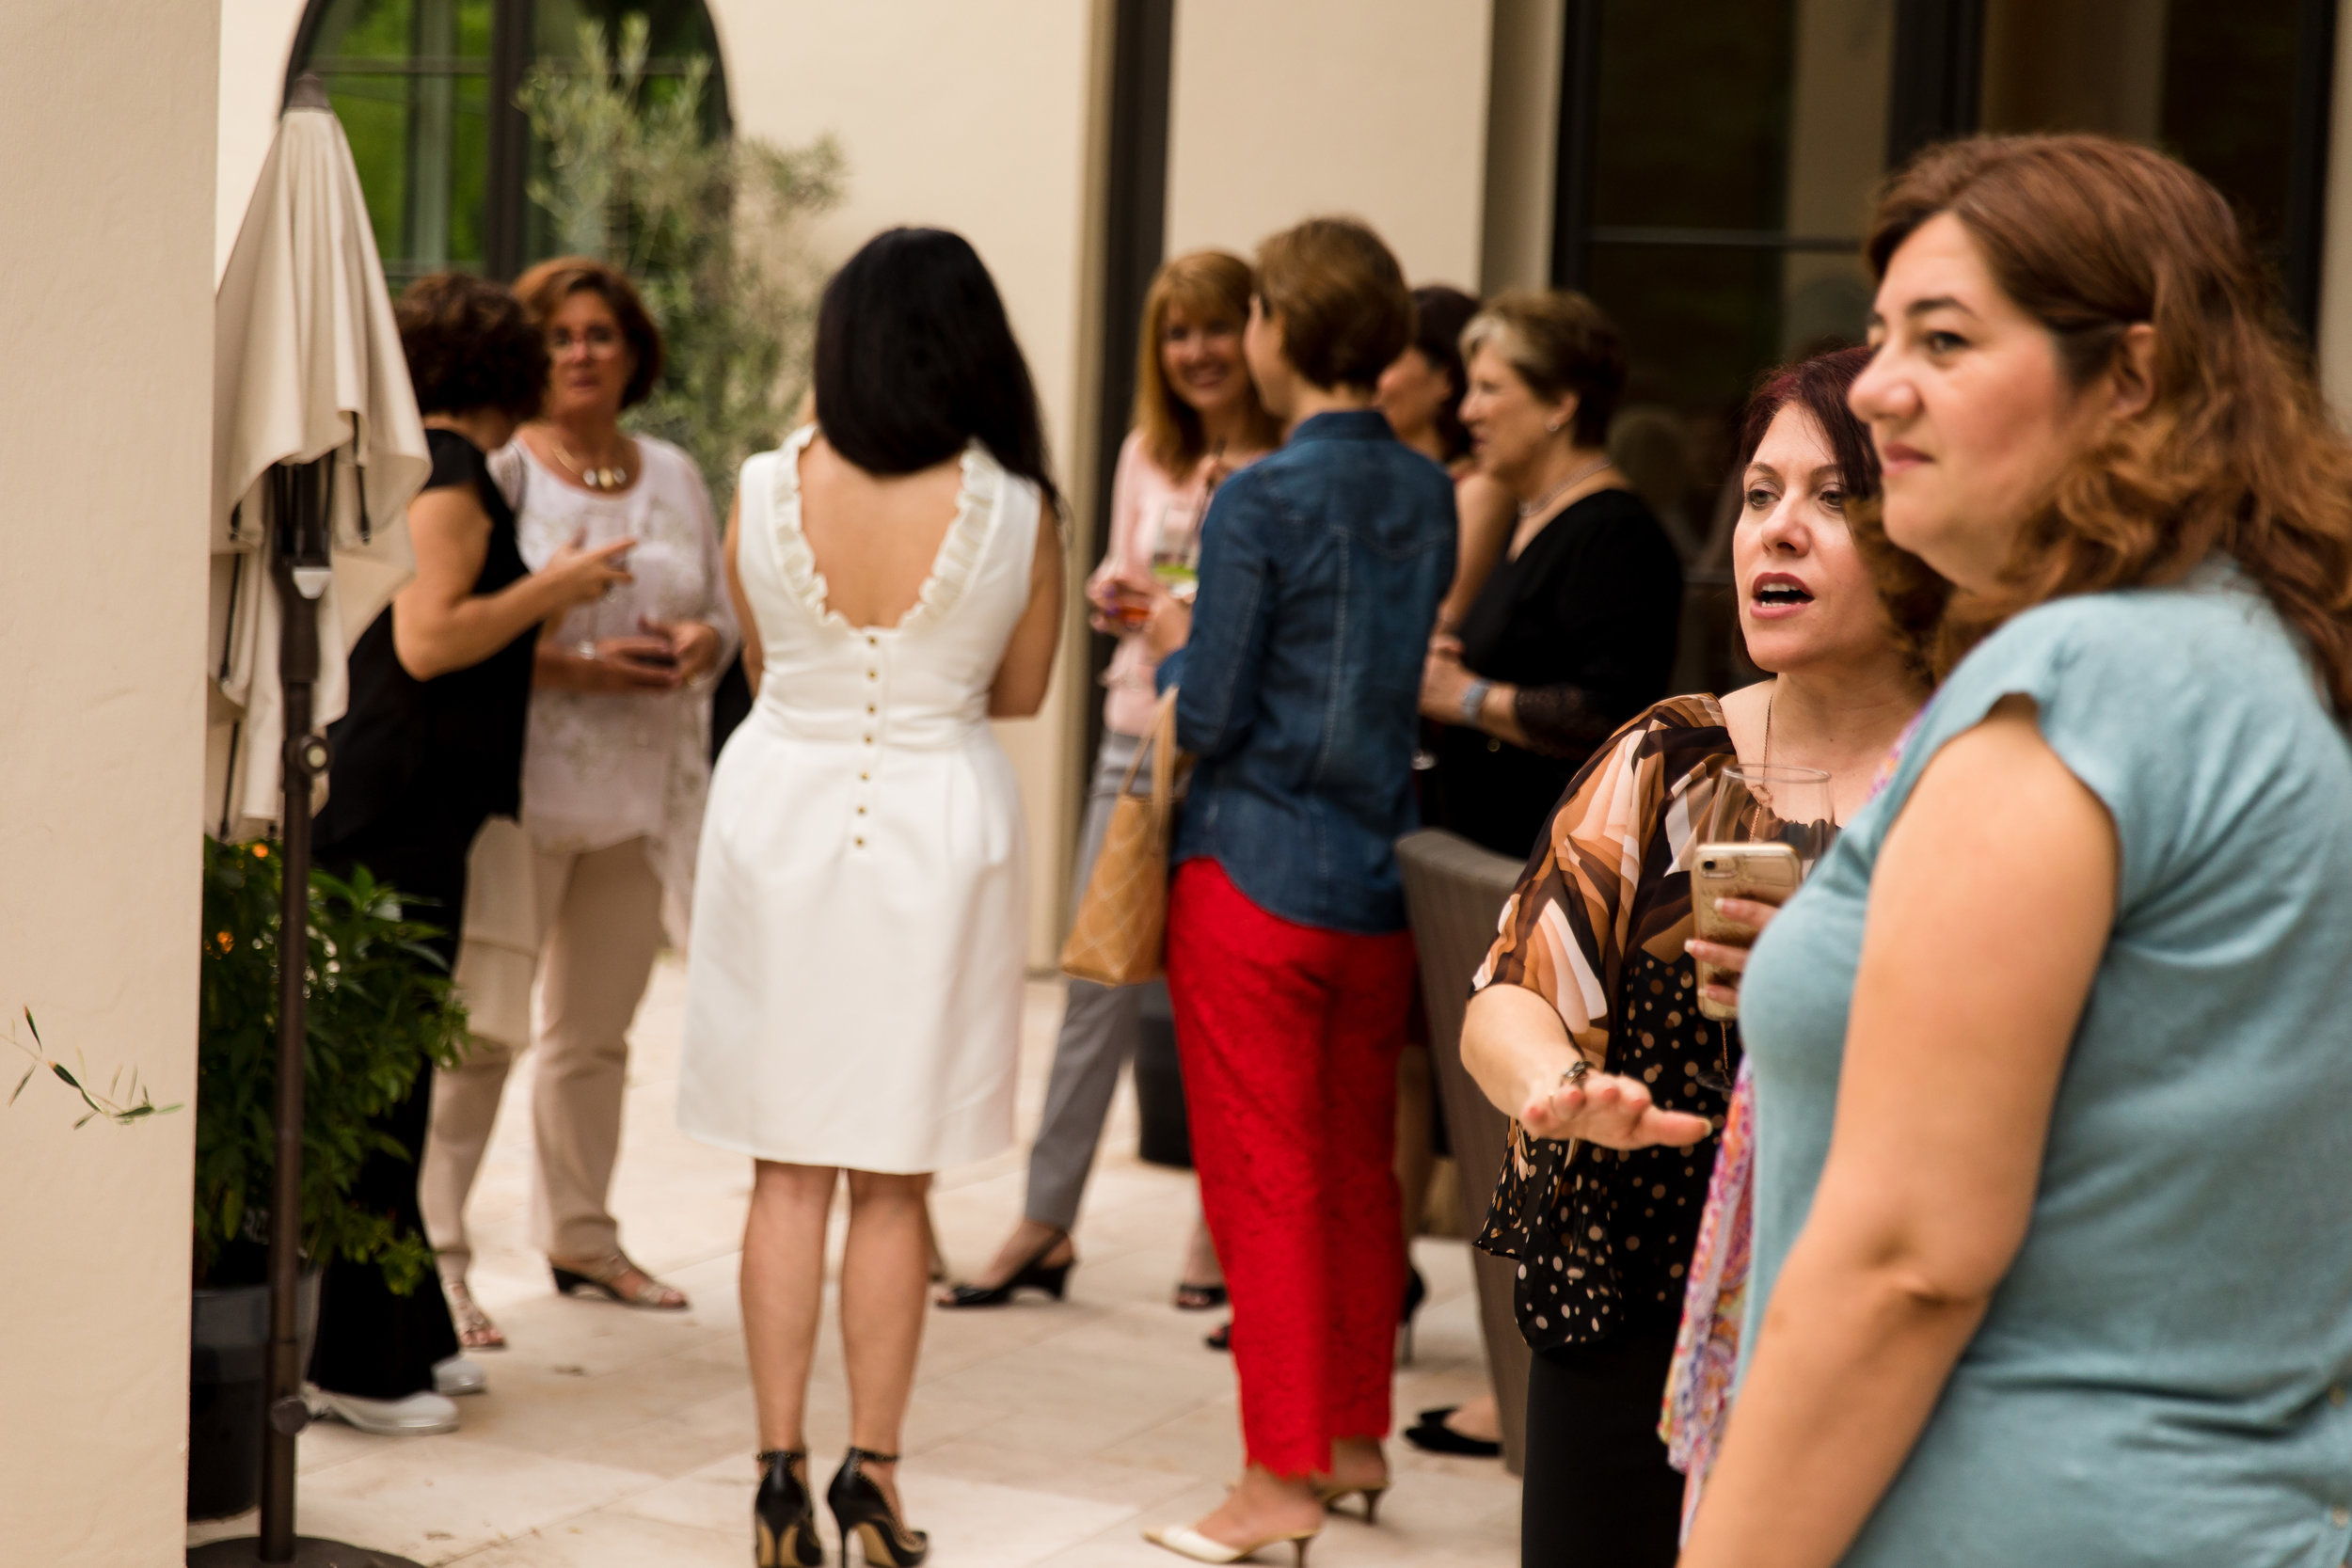 20180421-3rd Annual Education Women Turkey-259.jpg